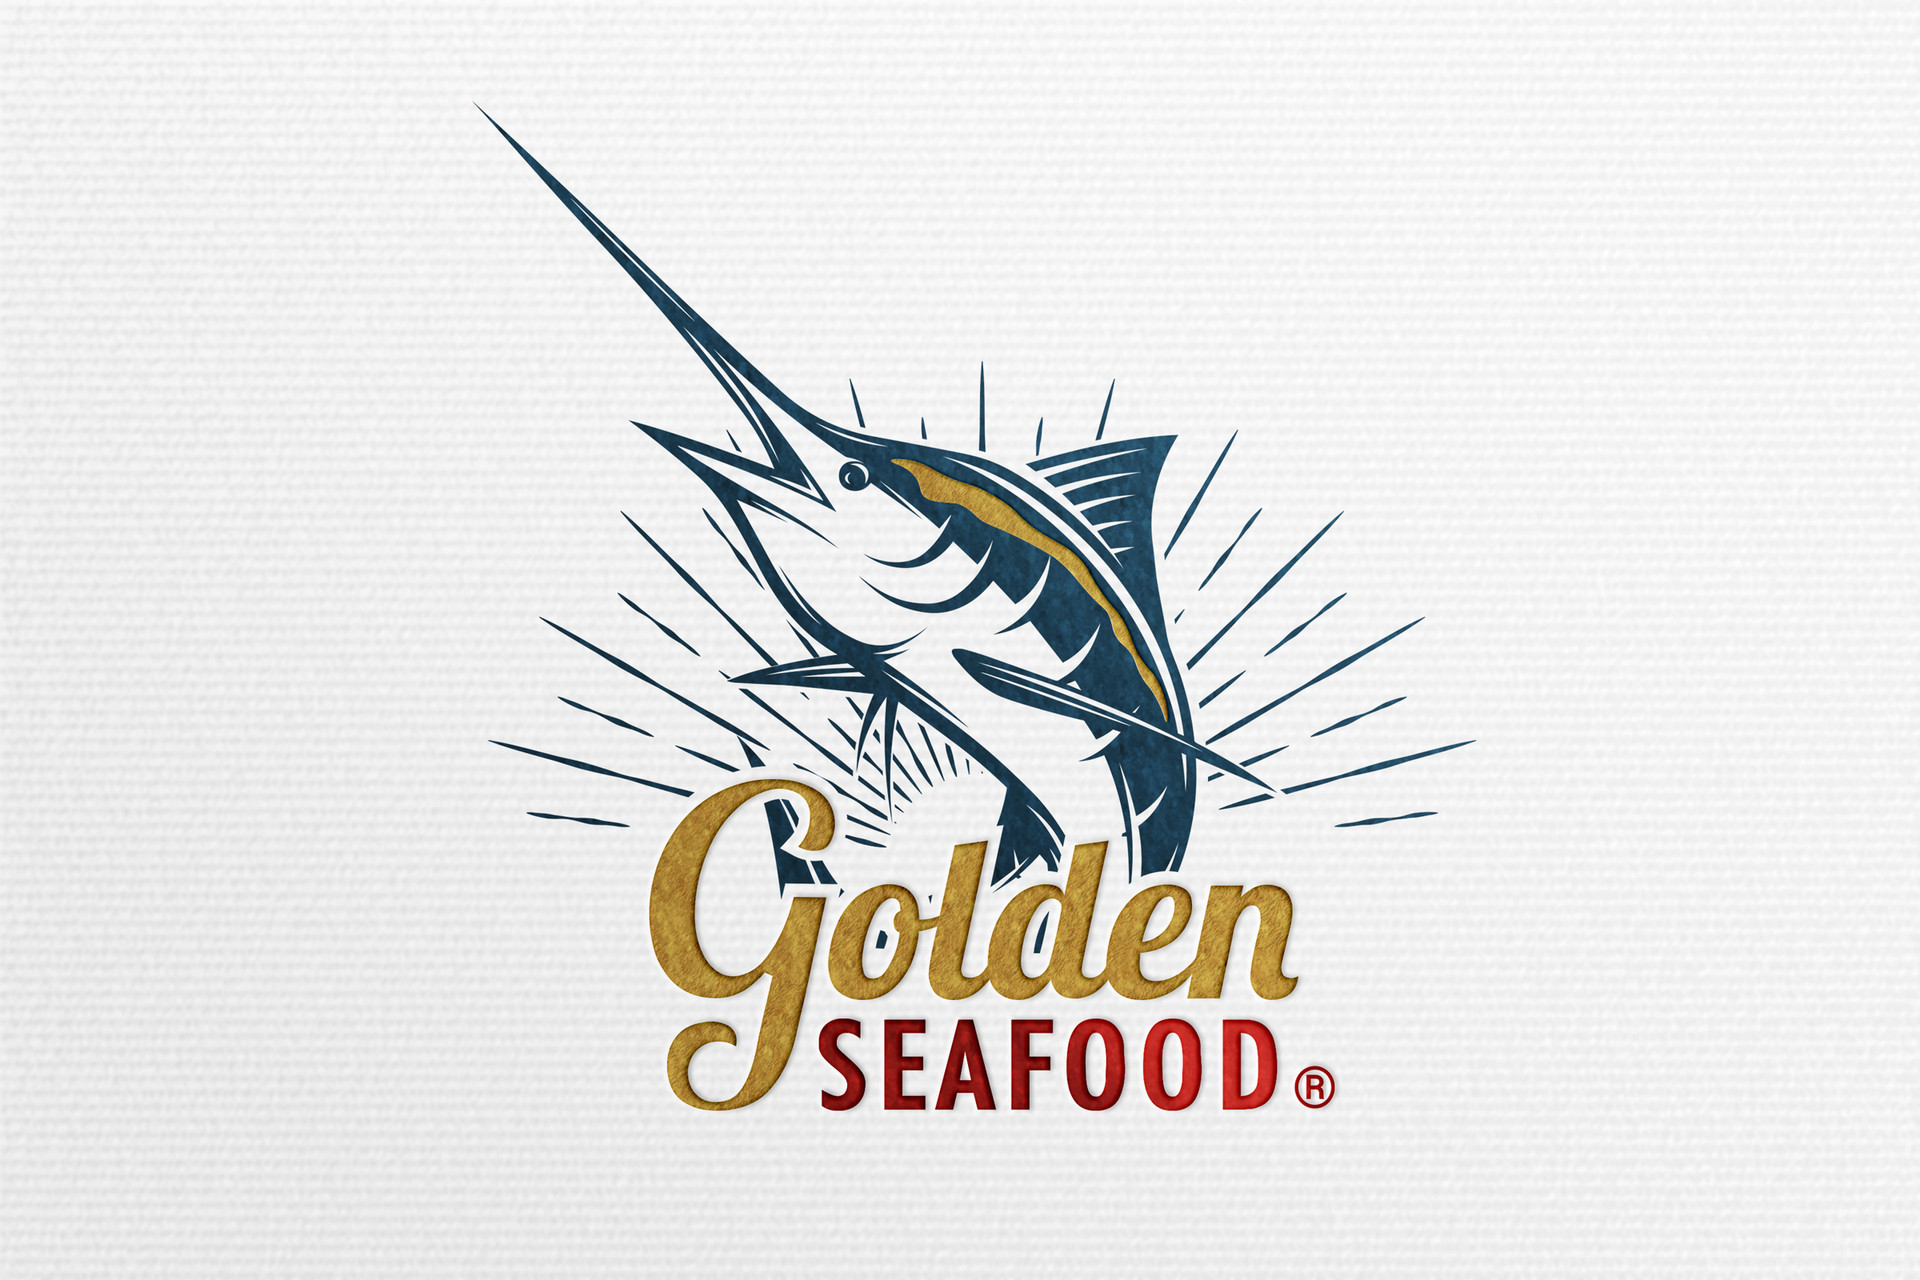 Golden-Seafood-logo.jpg